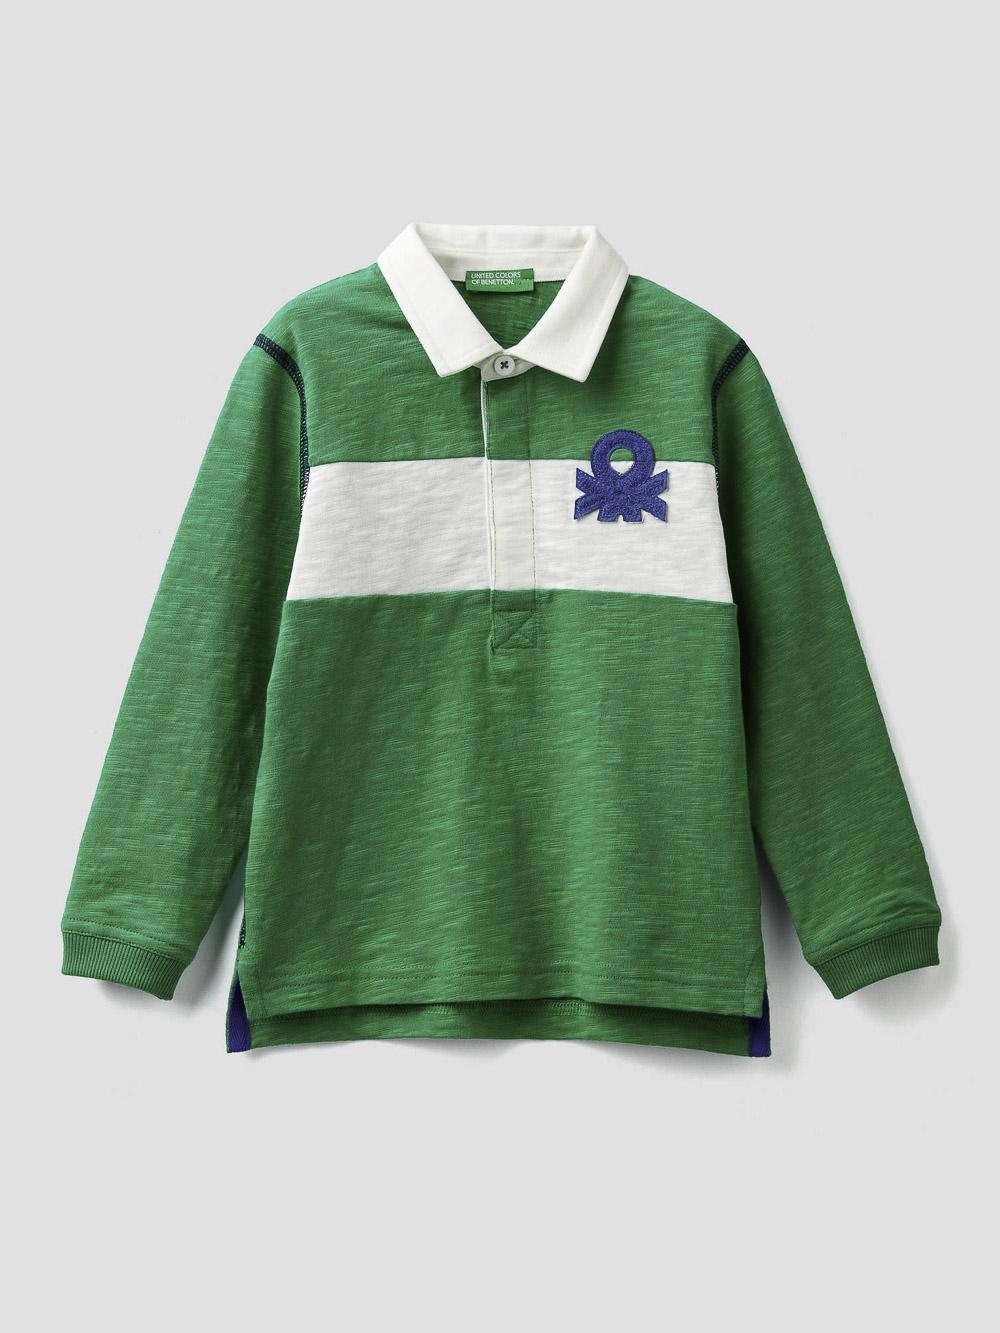 012 BENETTON Μπλούζα πόλο με φάσα κια λογότυπο 3BHJC3146 20A108